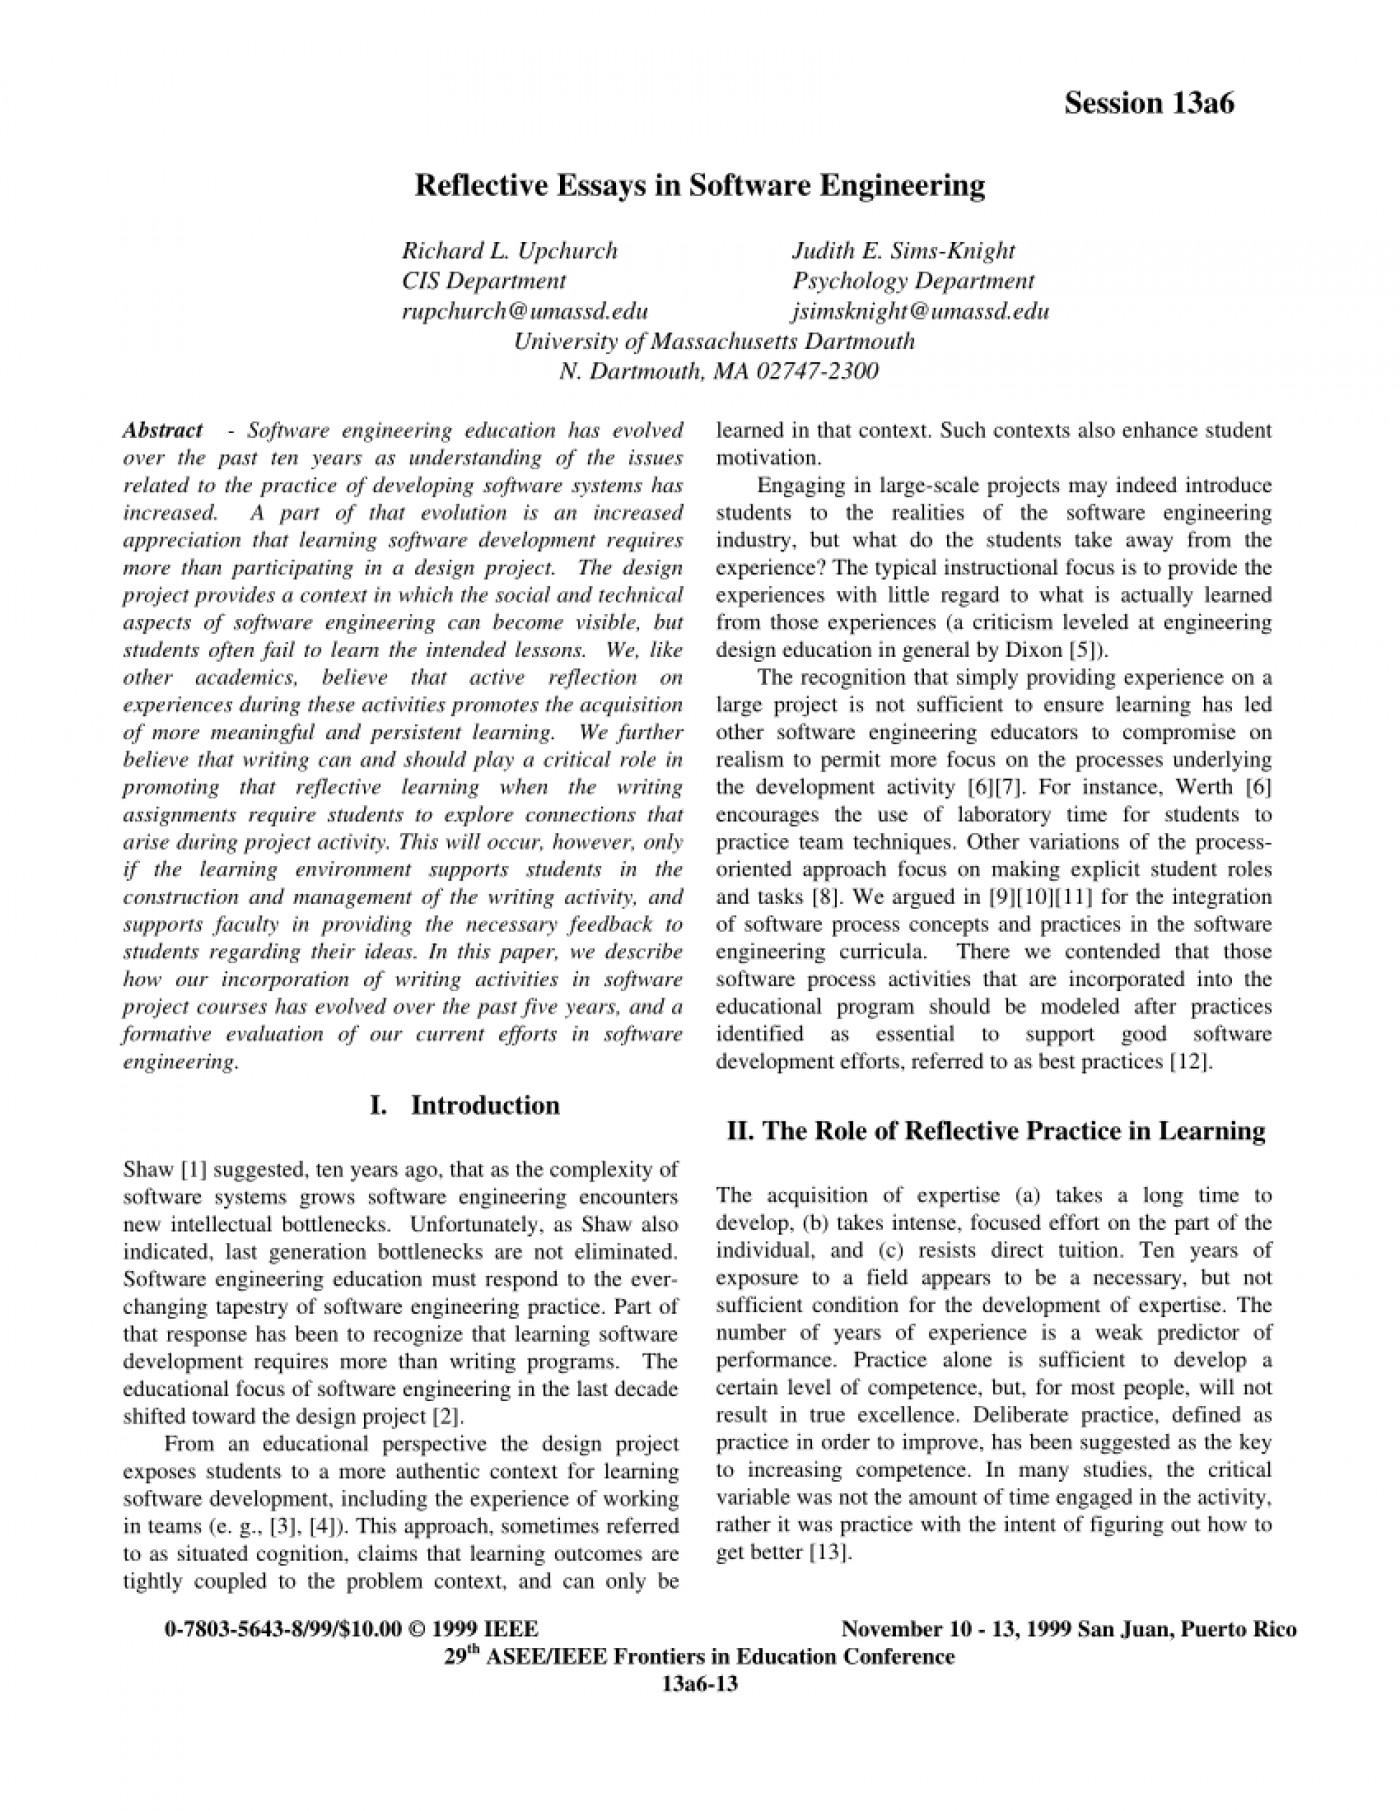 Reflective nursing essay